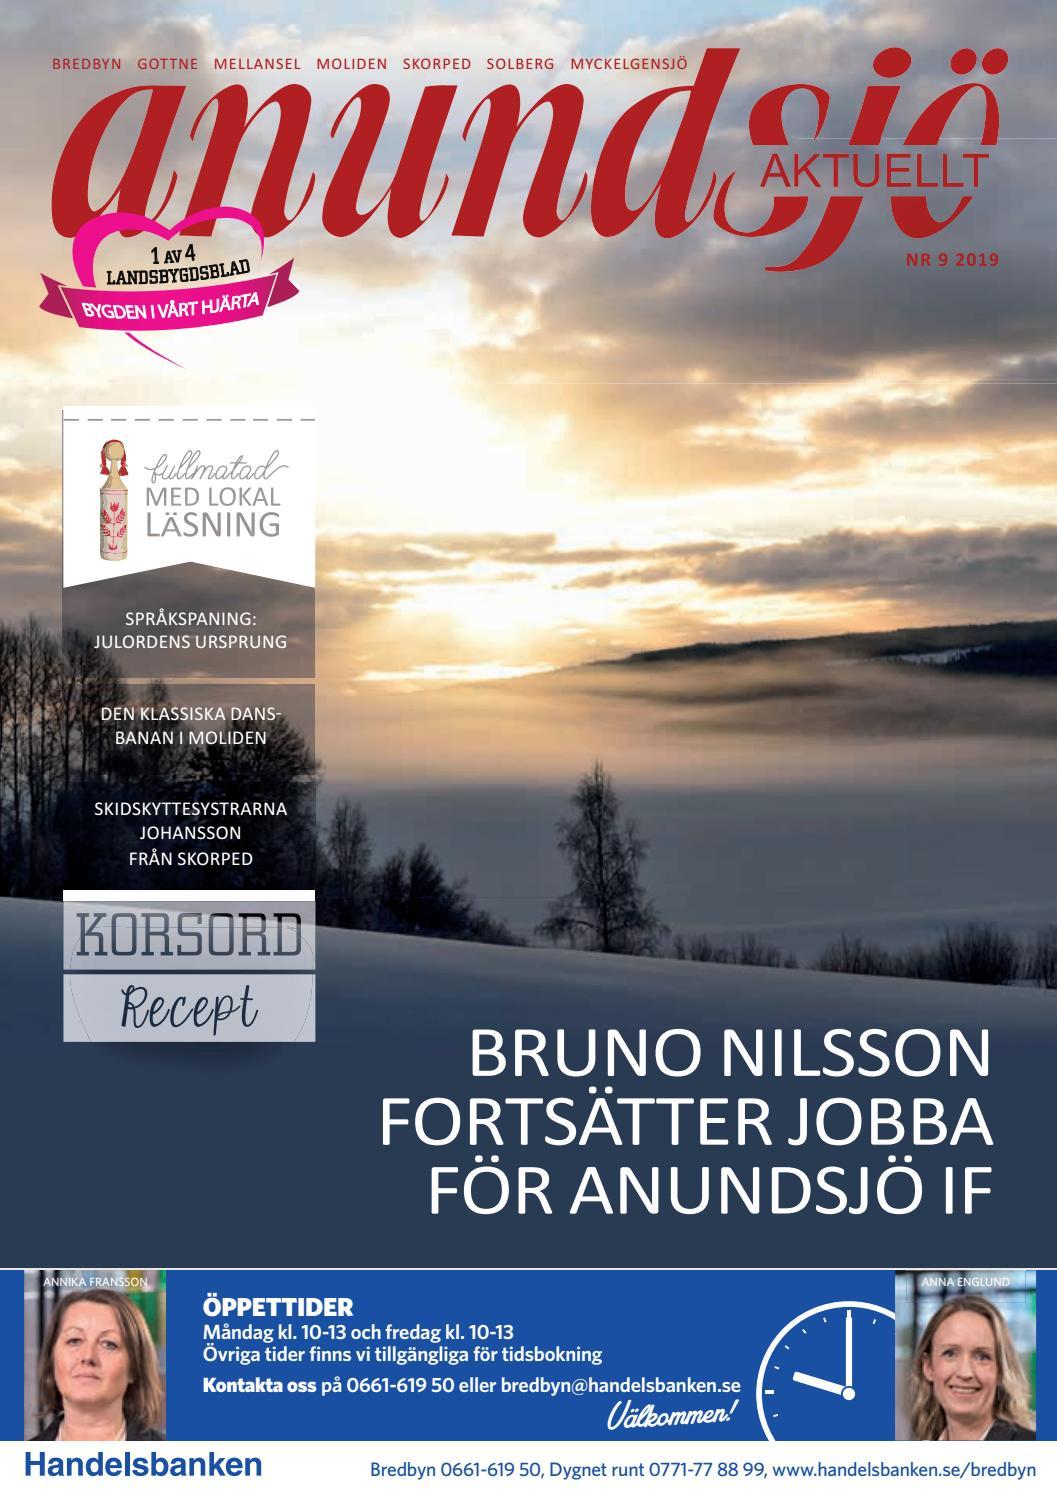 Anundsj Bygg AB - Posts | Facebook